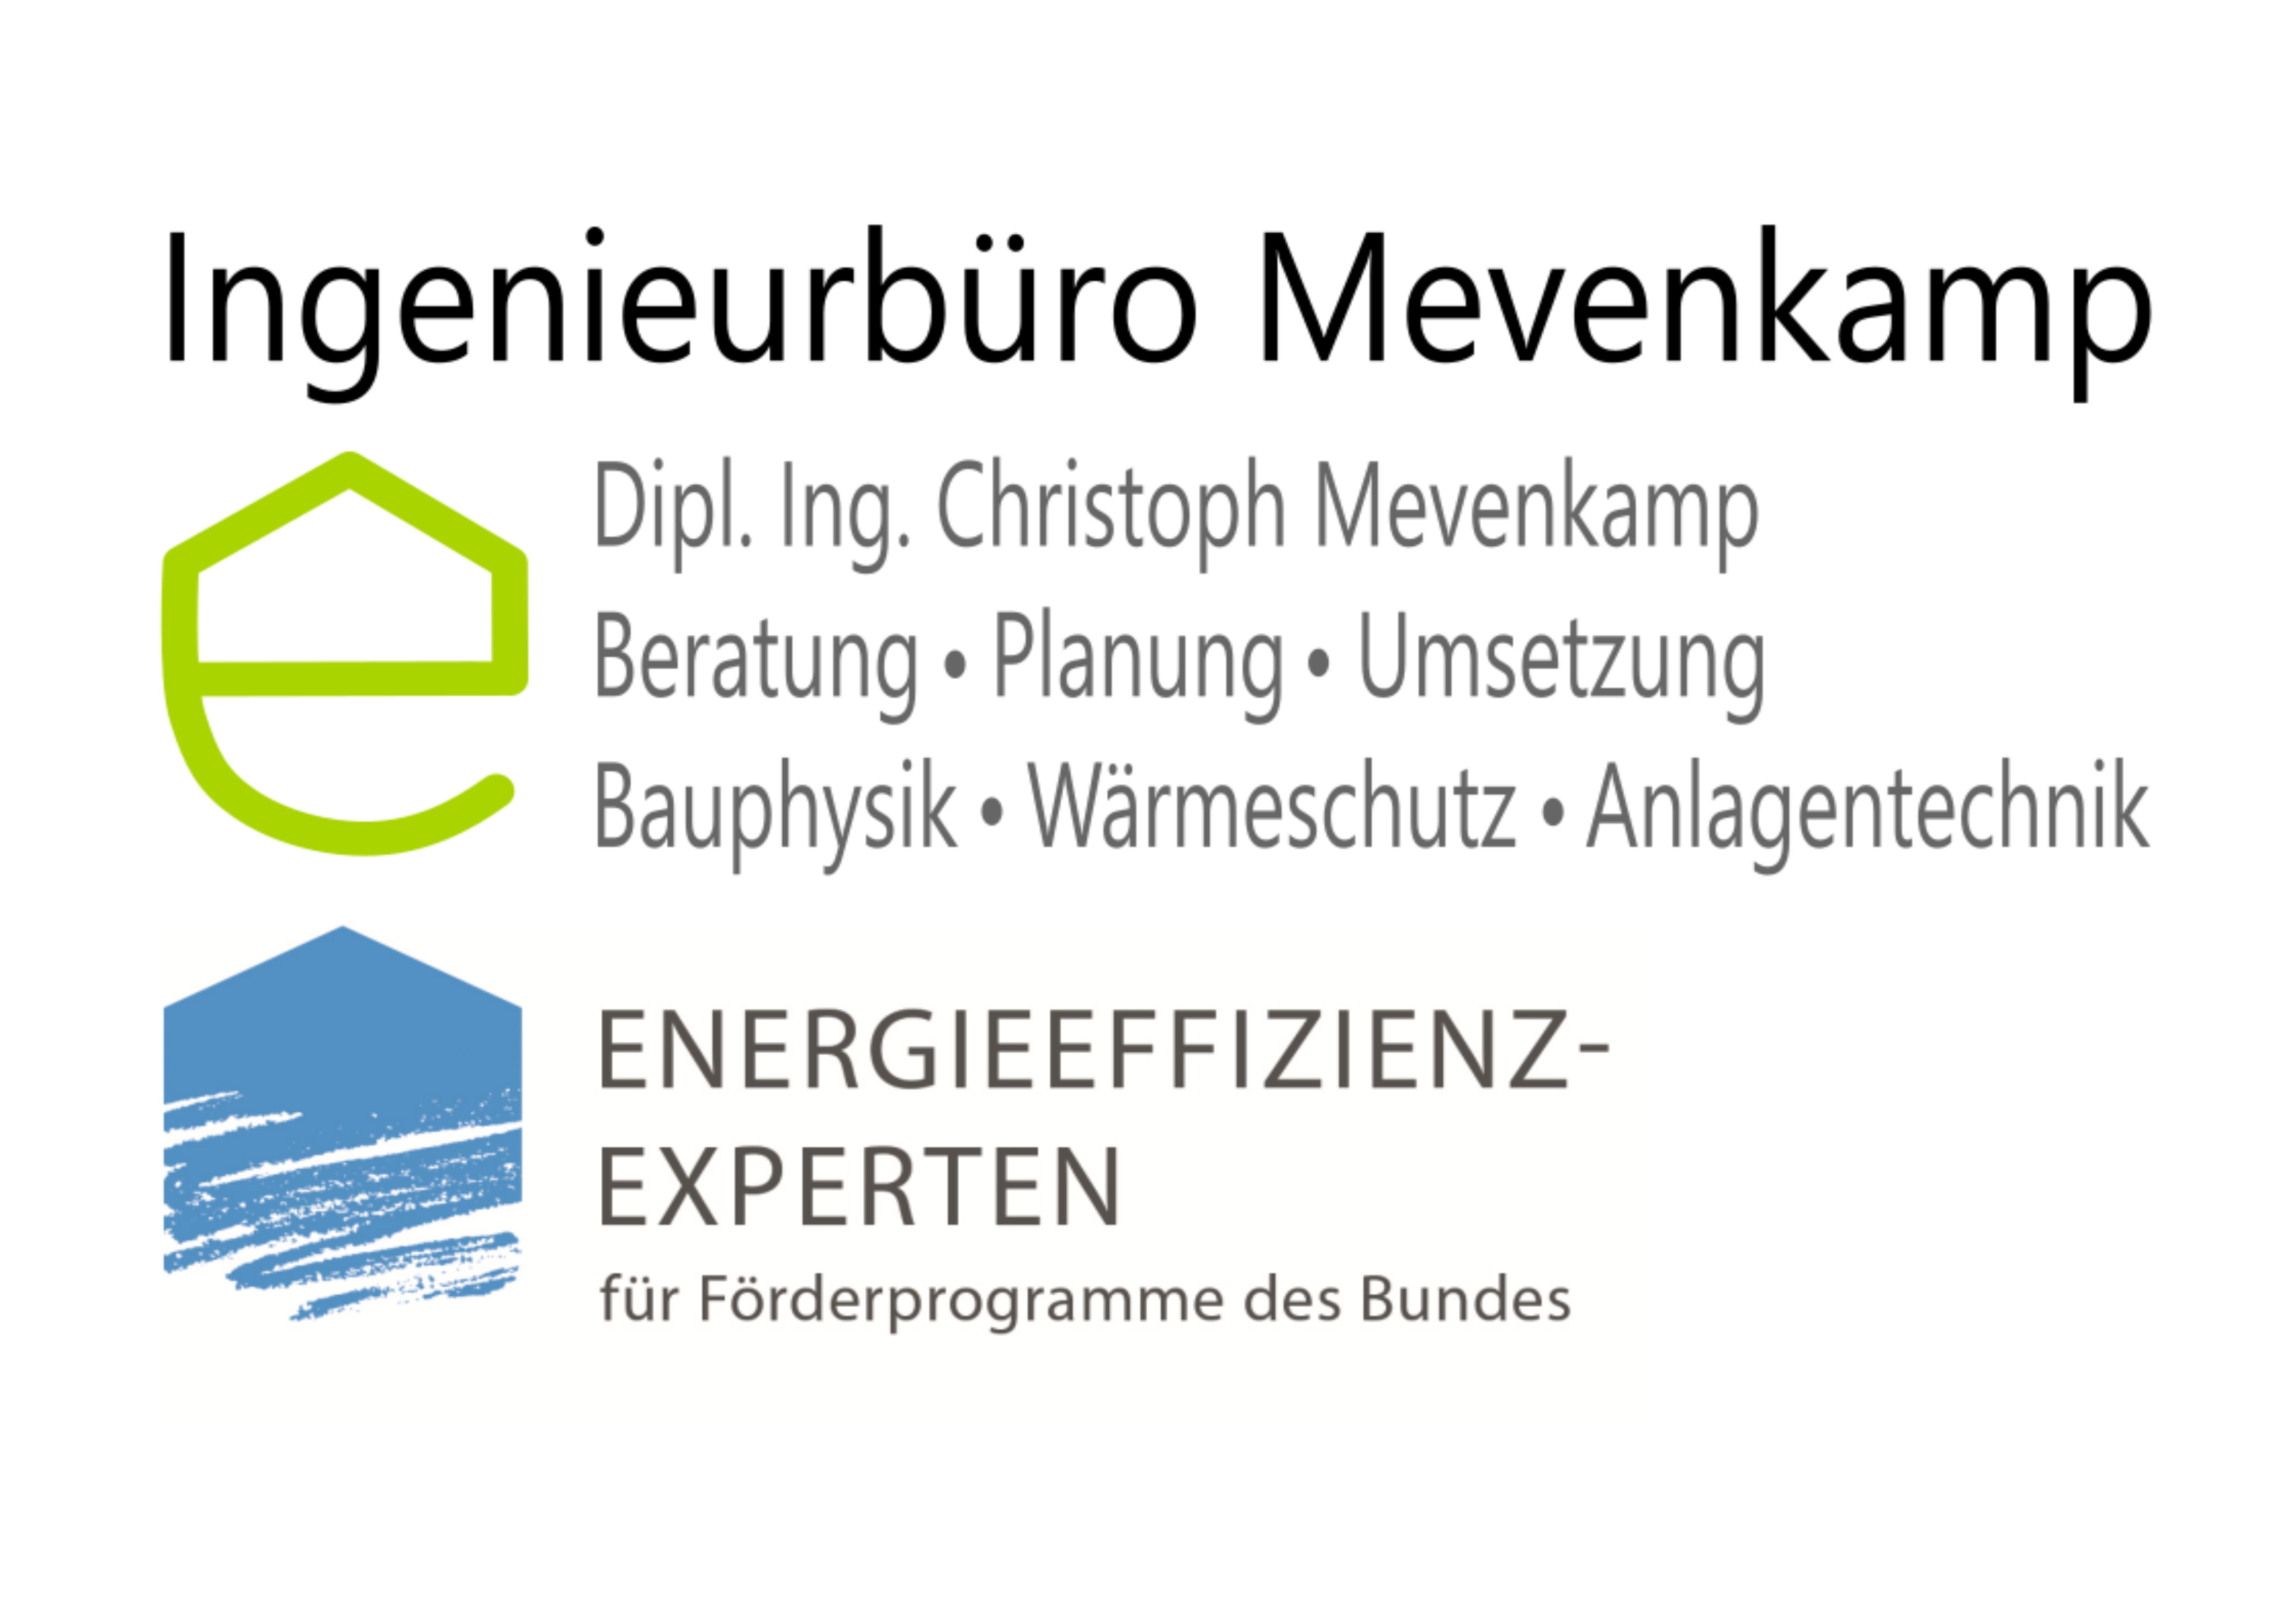 Ingenieurbüro Mevenkamp